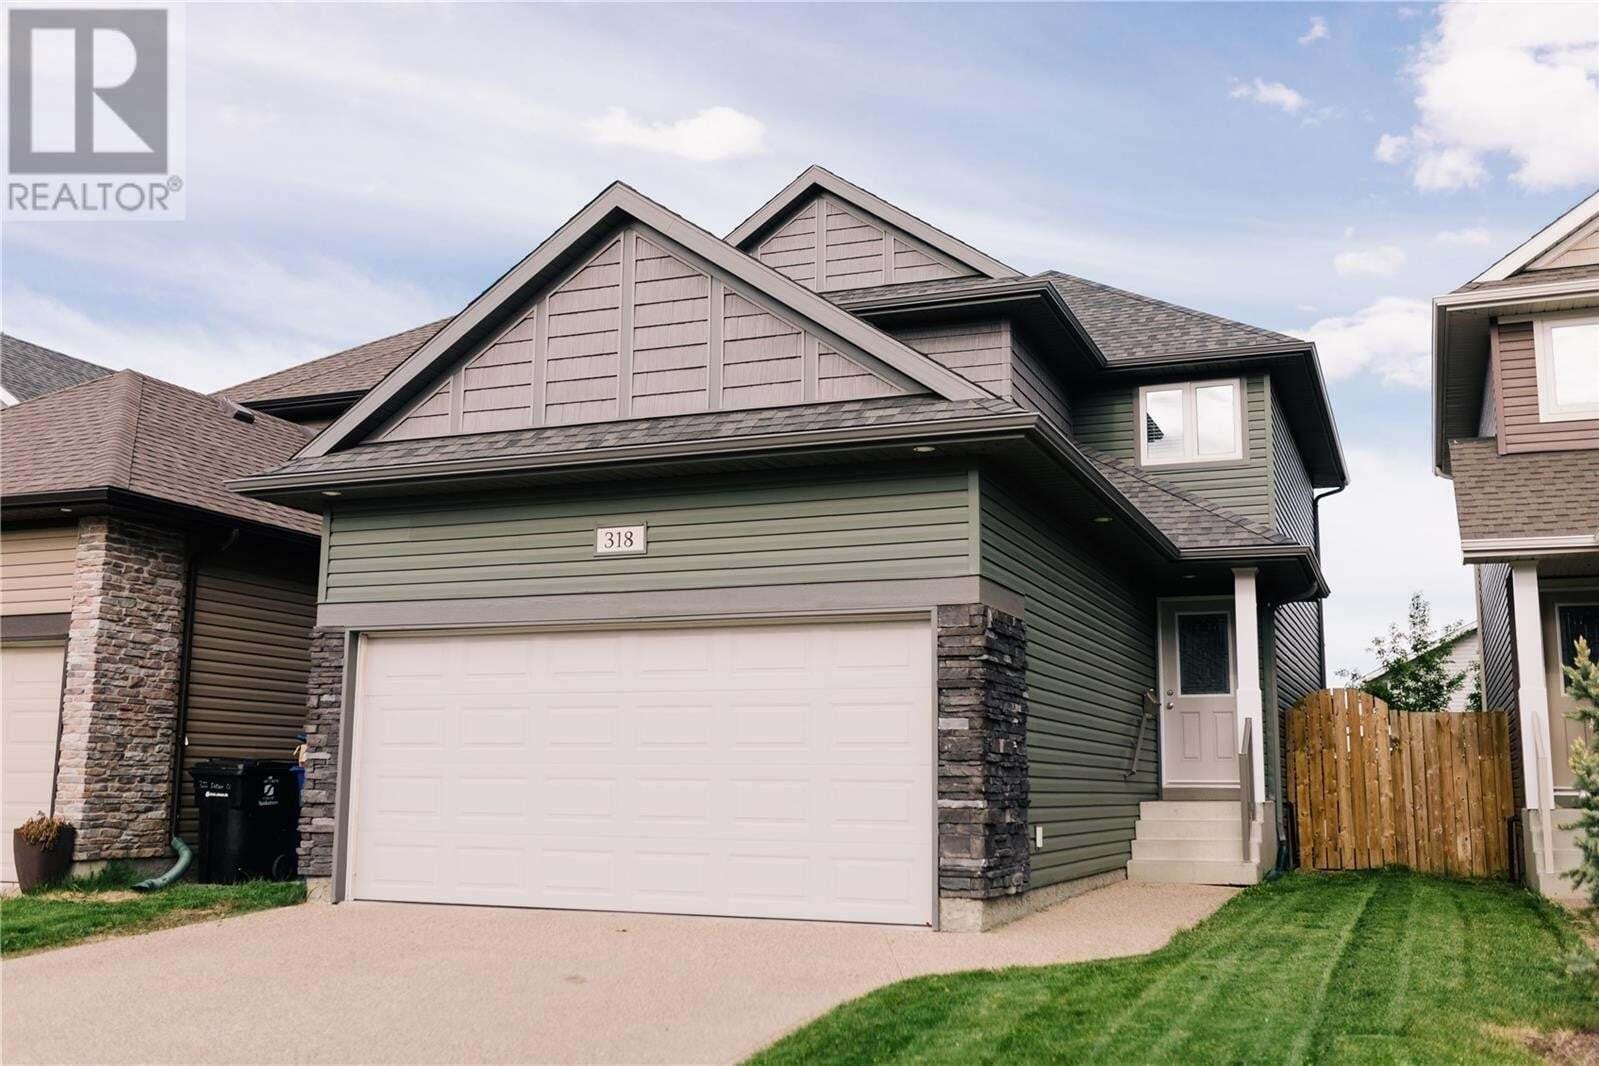 House for sale at 318 Dickson Cres Saskatoon Saskatchewan - MLS: SK811531